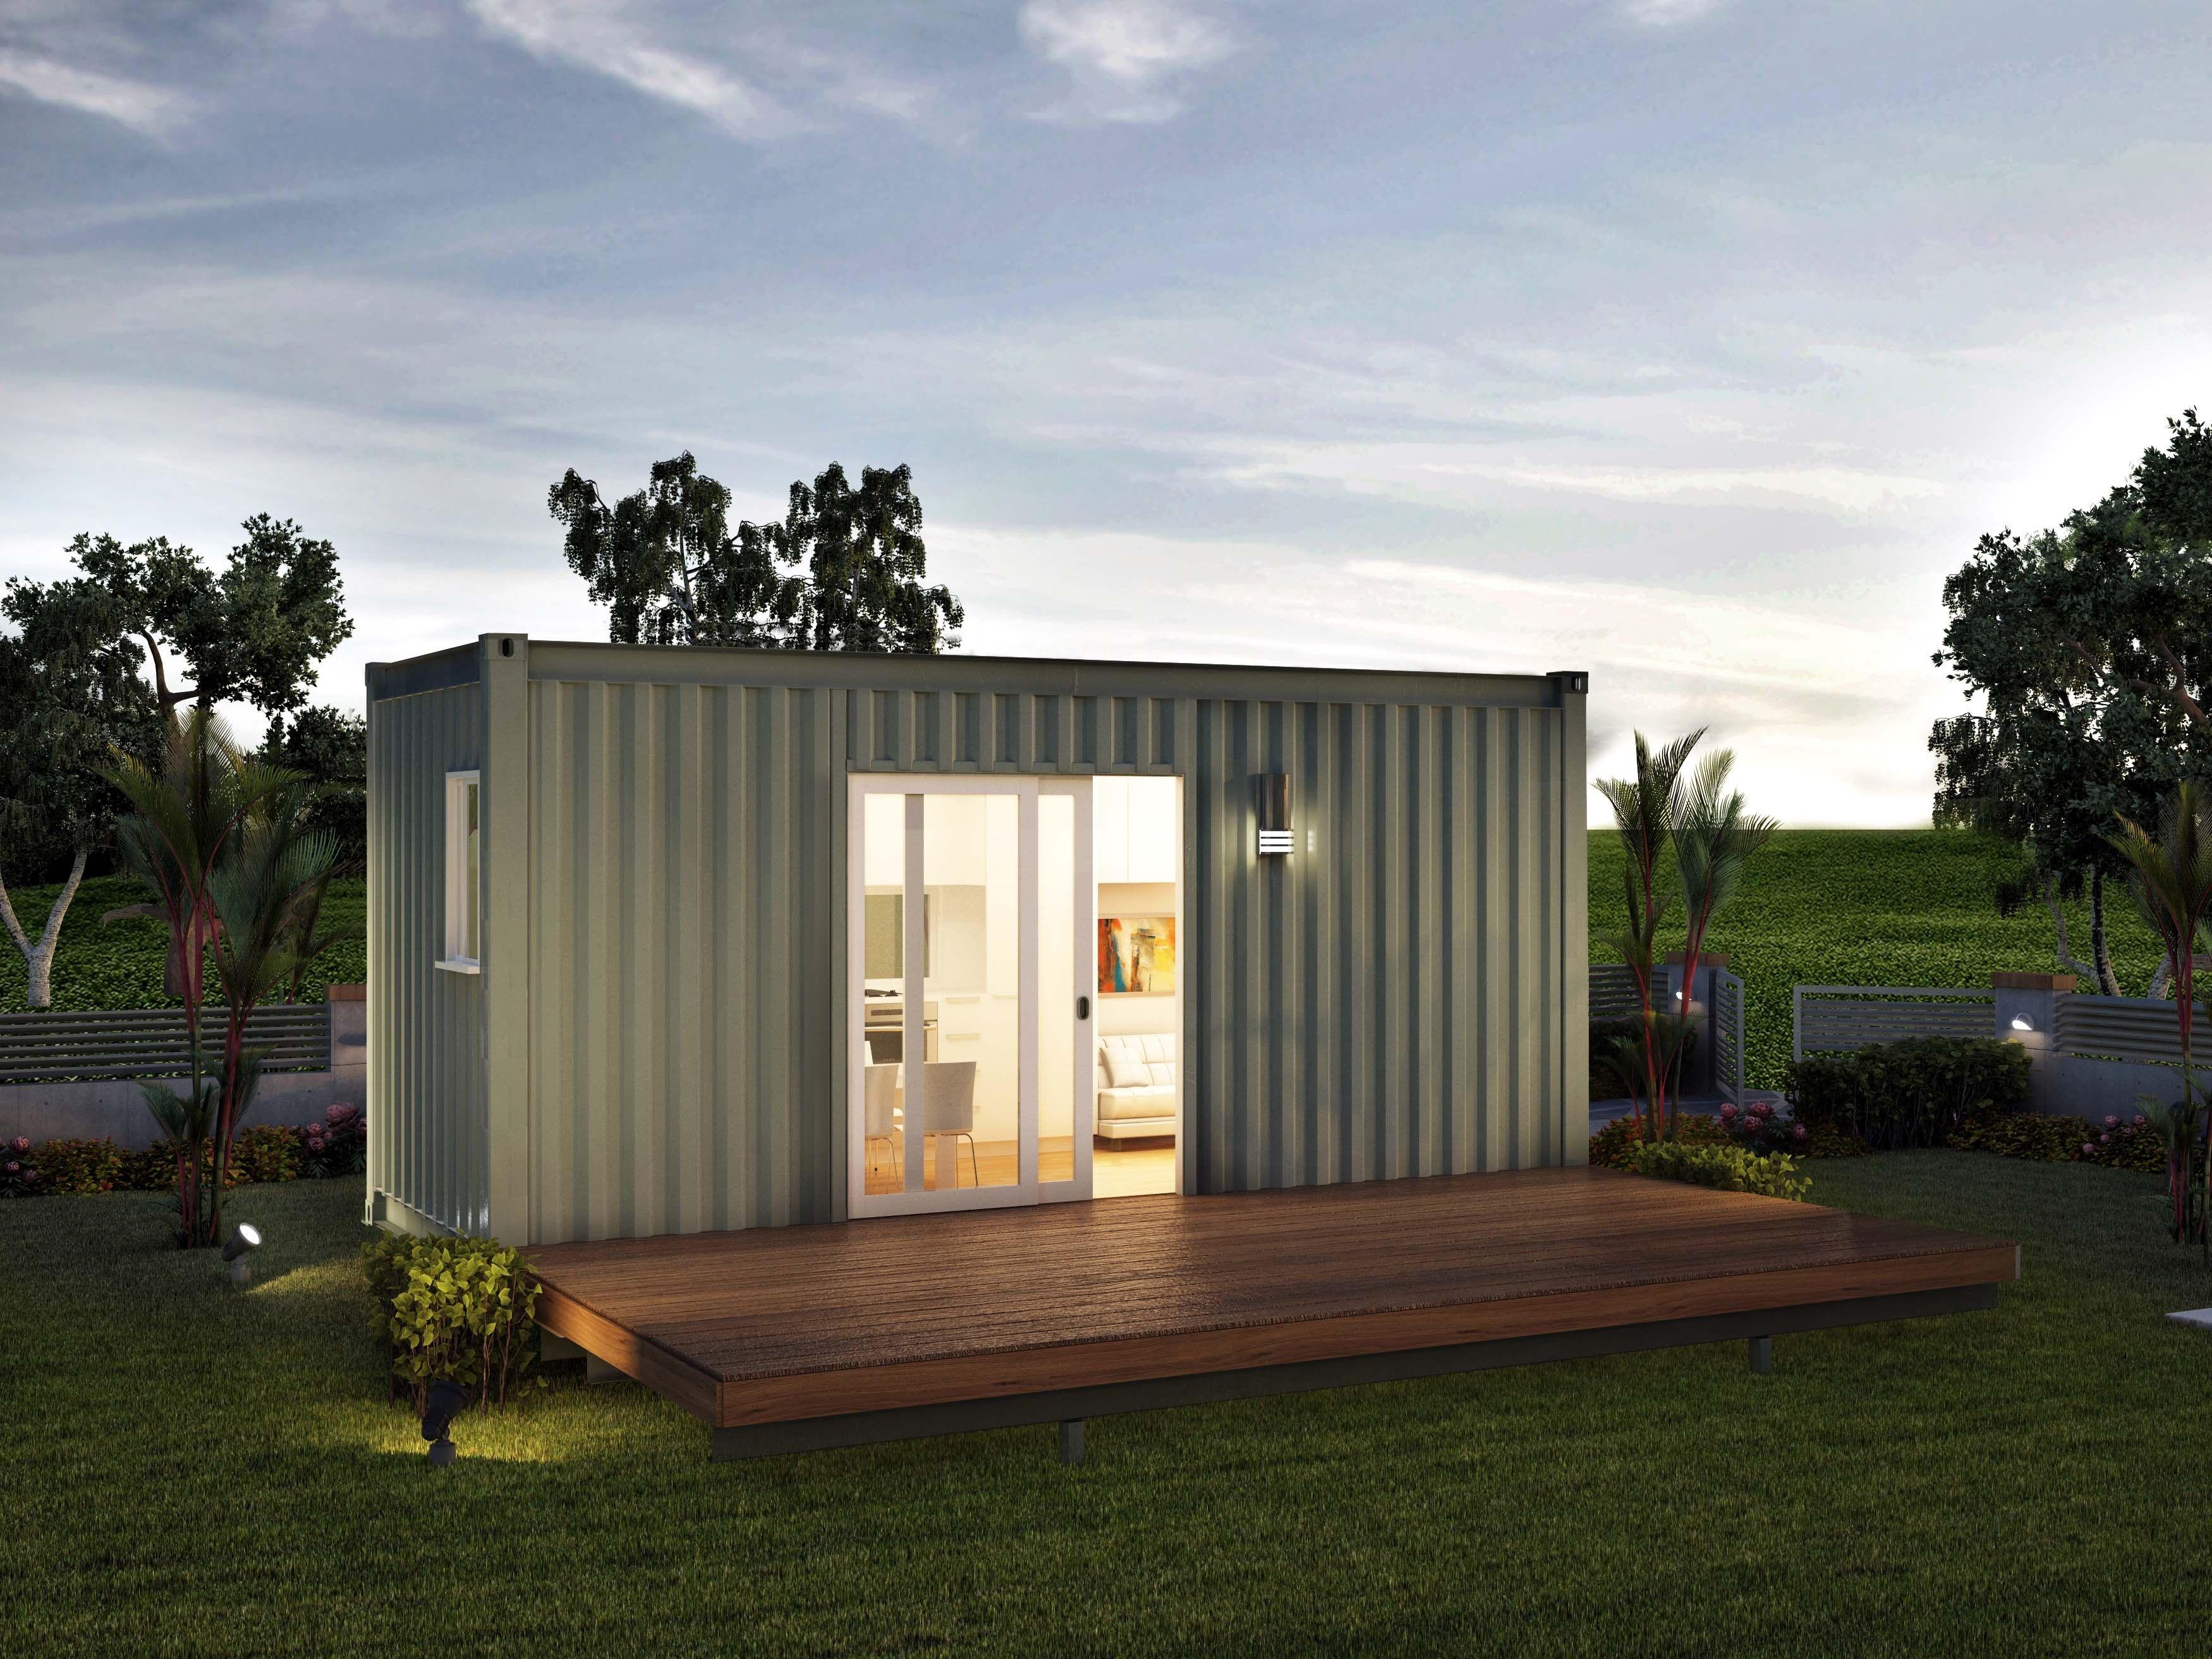 Nova Deko Granny Flat Studio Santa Fe Prefabricated One Bed Modular ...